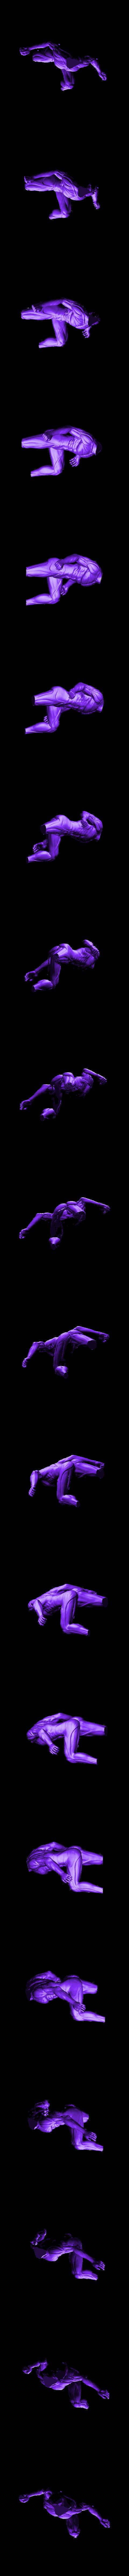 AoT_Final_Body_2.stl Download free STL file Eren - Attack on Titan • 3D print model, mag-net